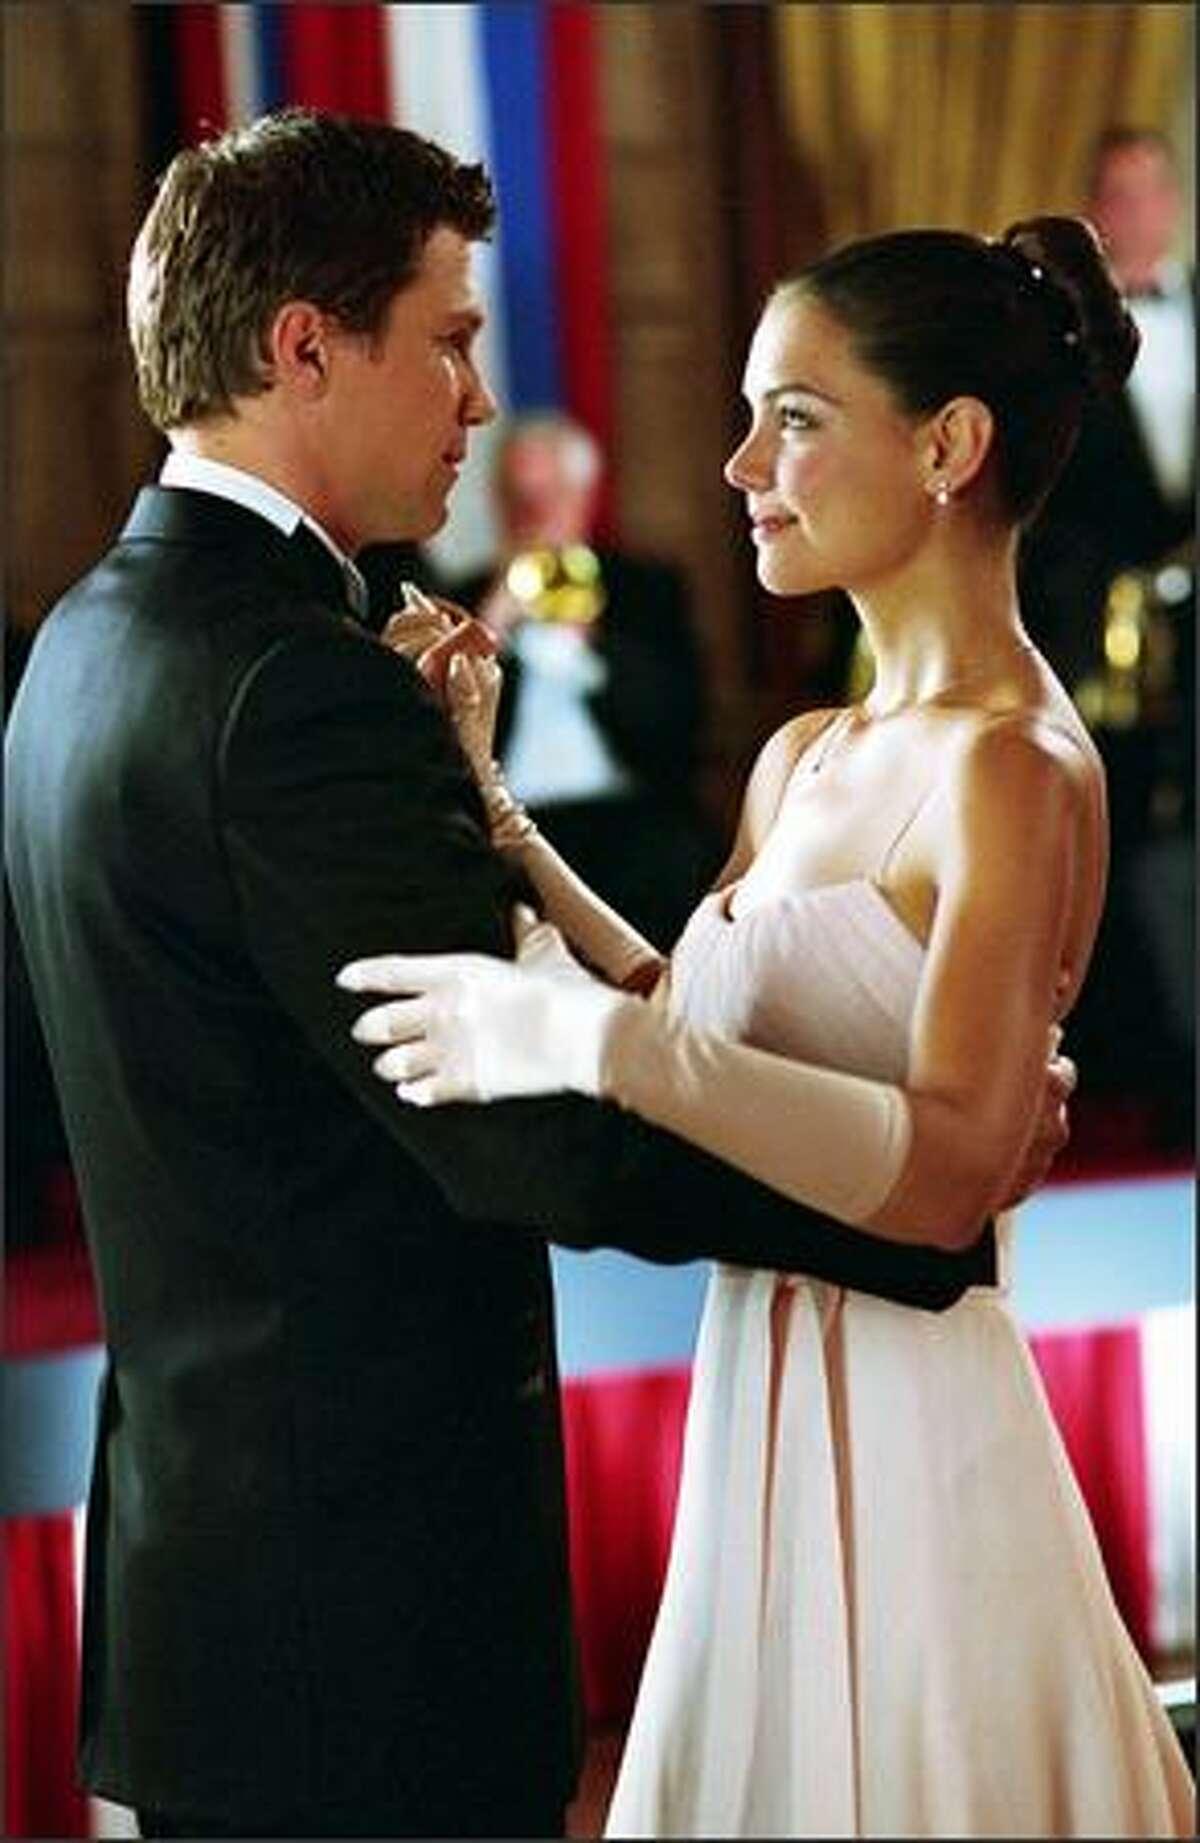 Samantha, (Katie Holmes) enjoys a romantic evening with new boyfriend James (Marc Blucas).